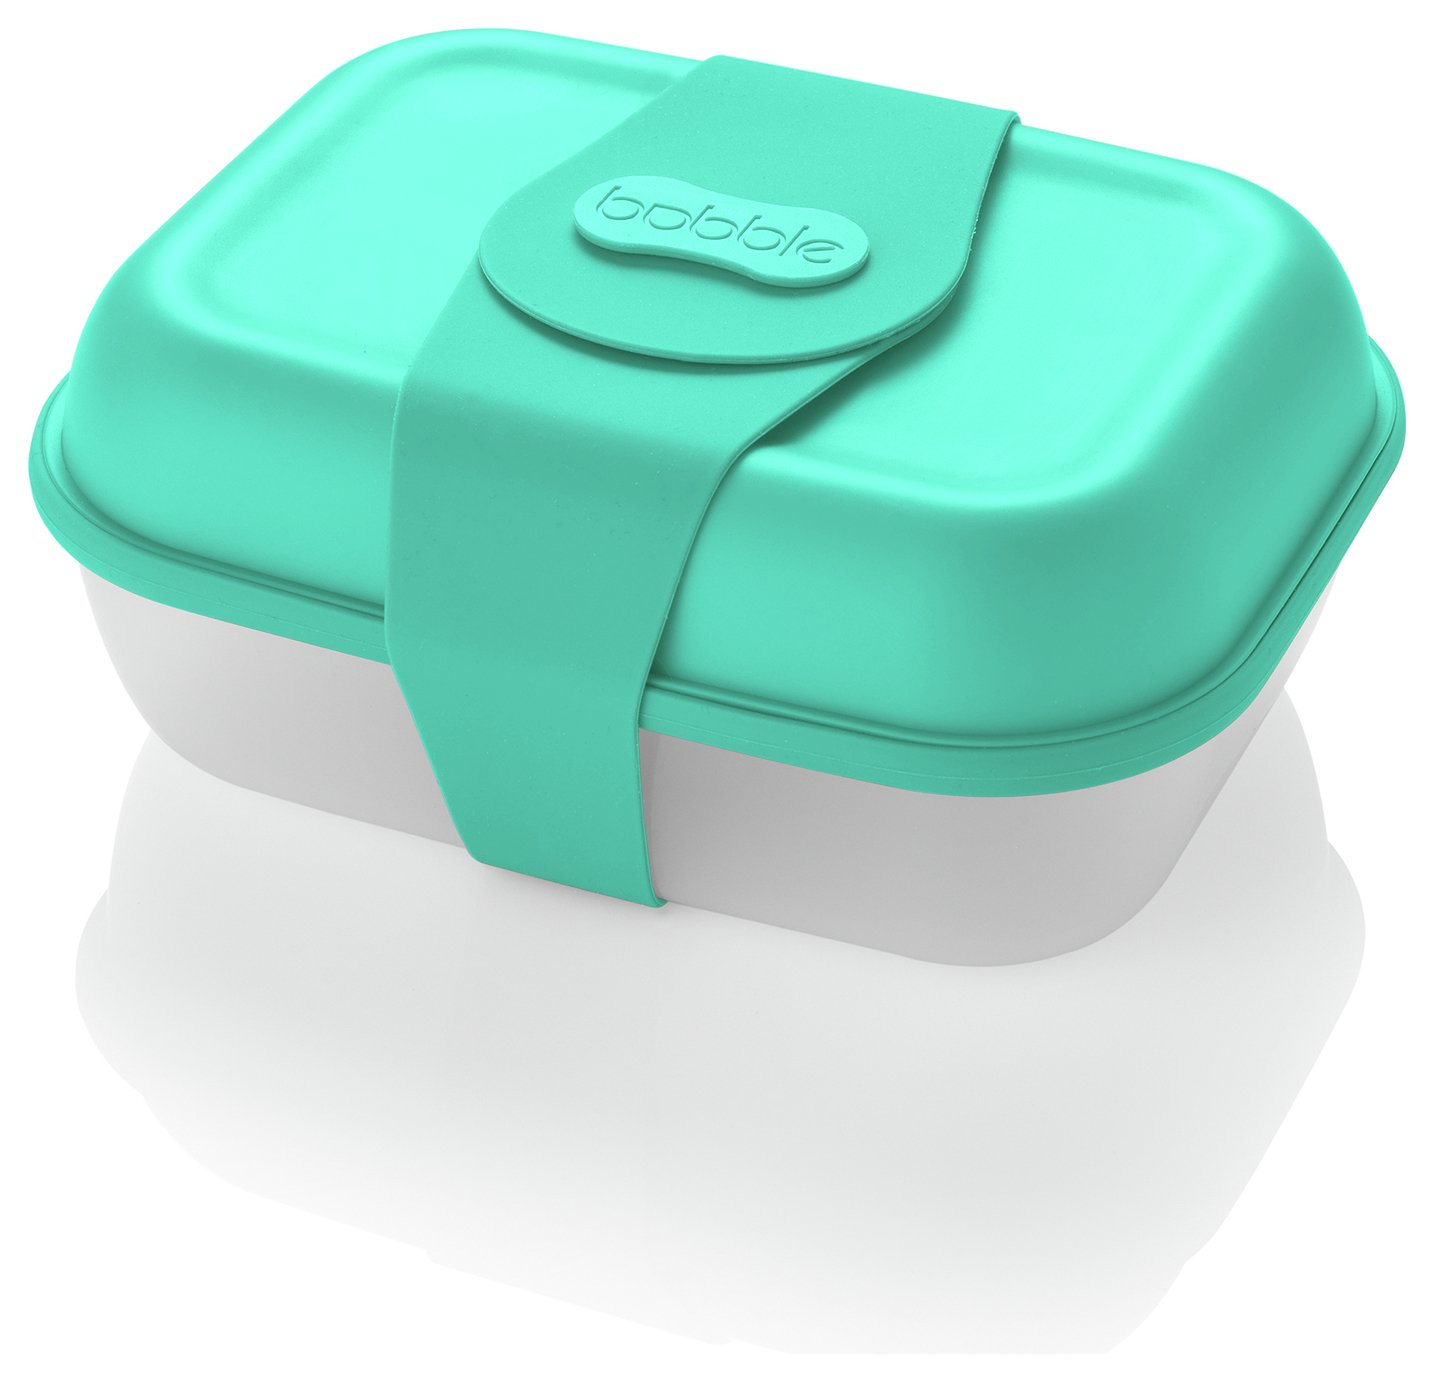 BobbleBox 1.8L Lunchbox - Blue